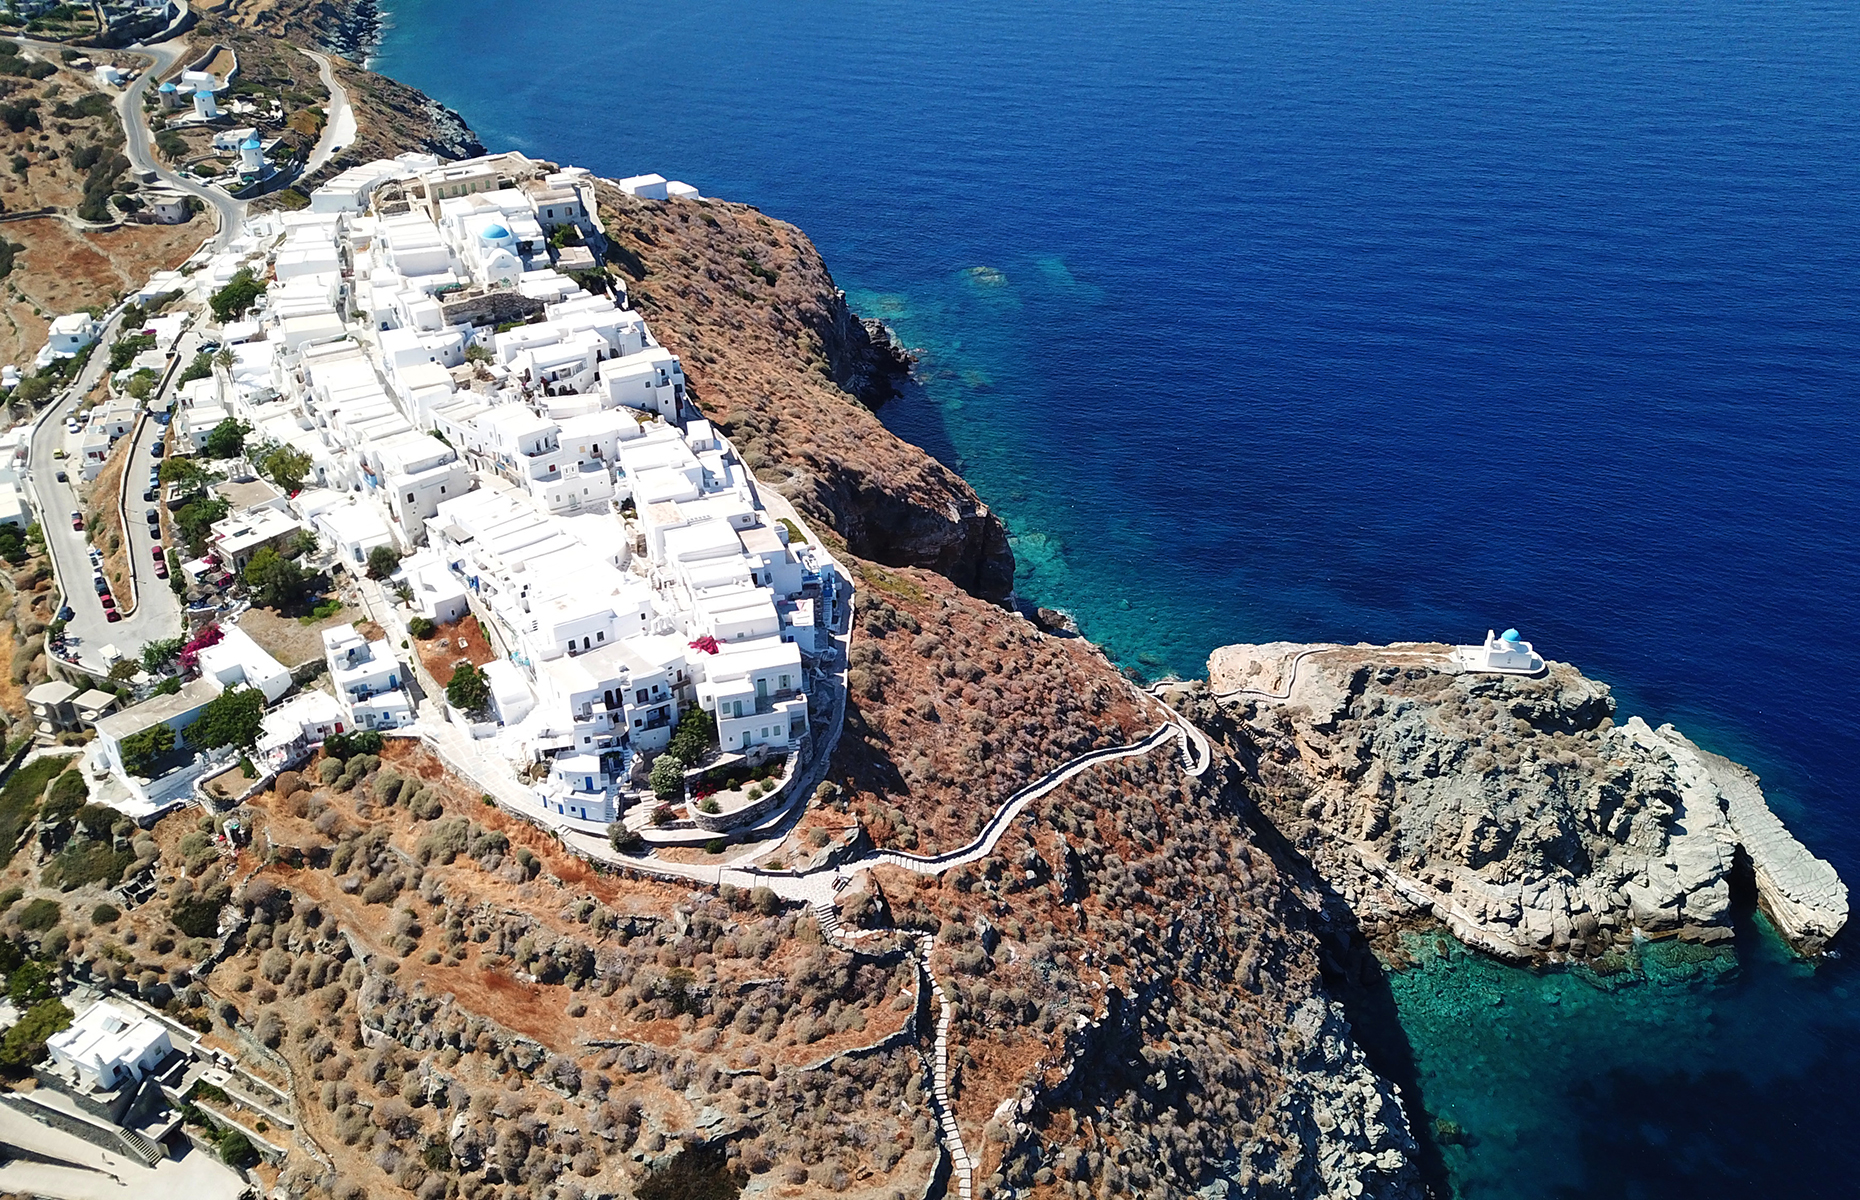 Kastro village on Sifnos (Image: Aerial-motion/Shutterstock)